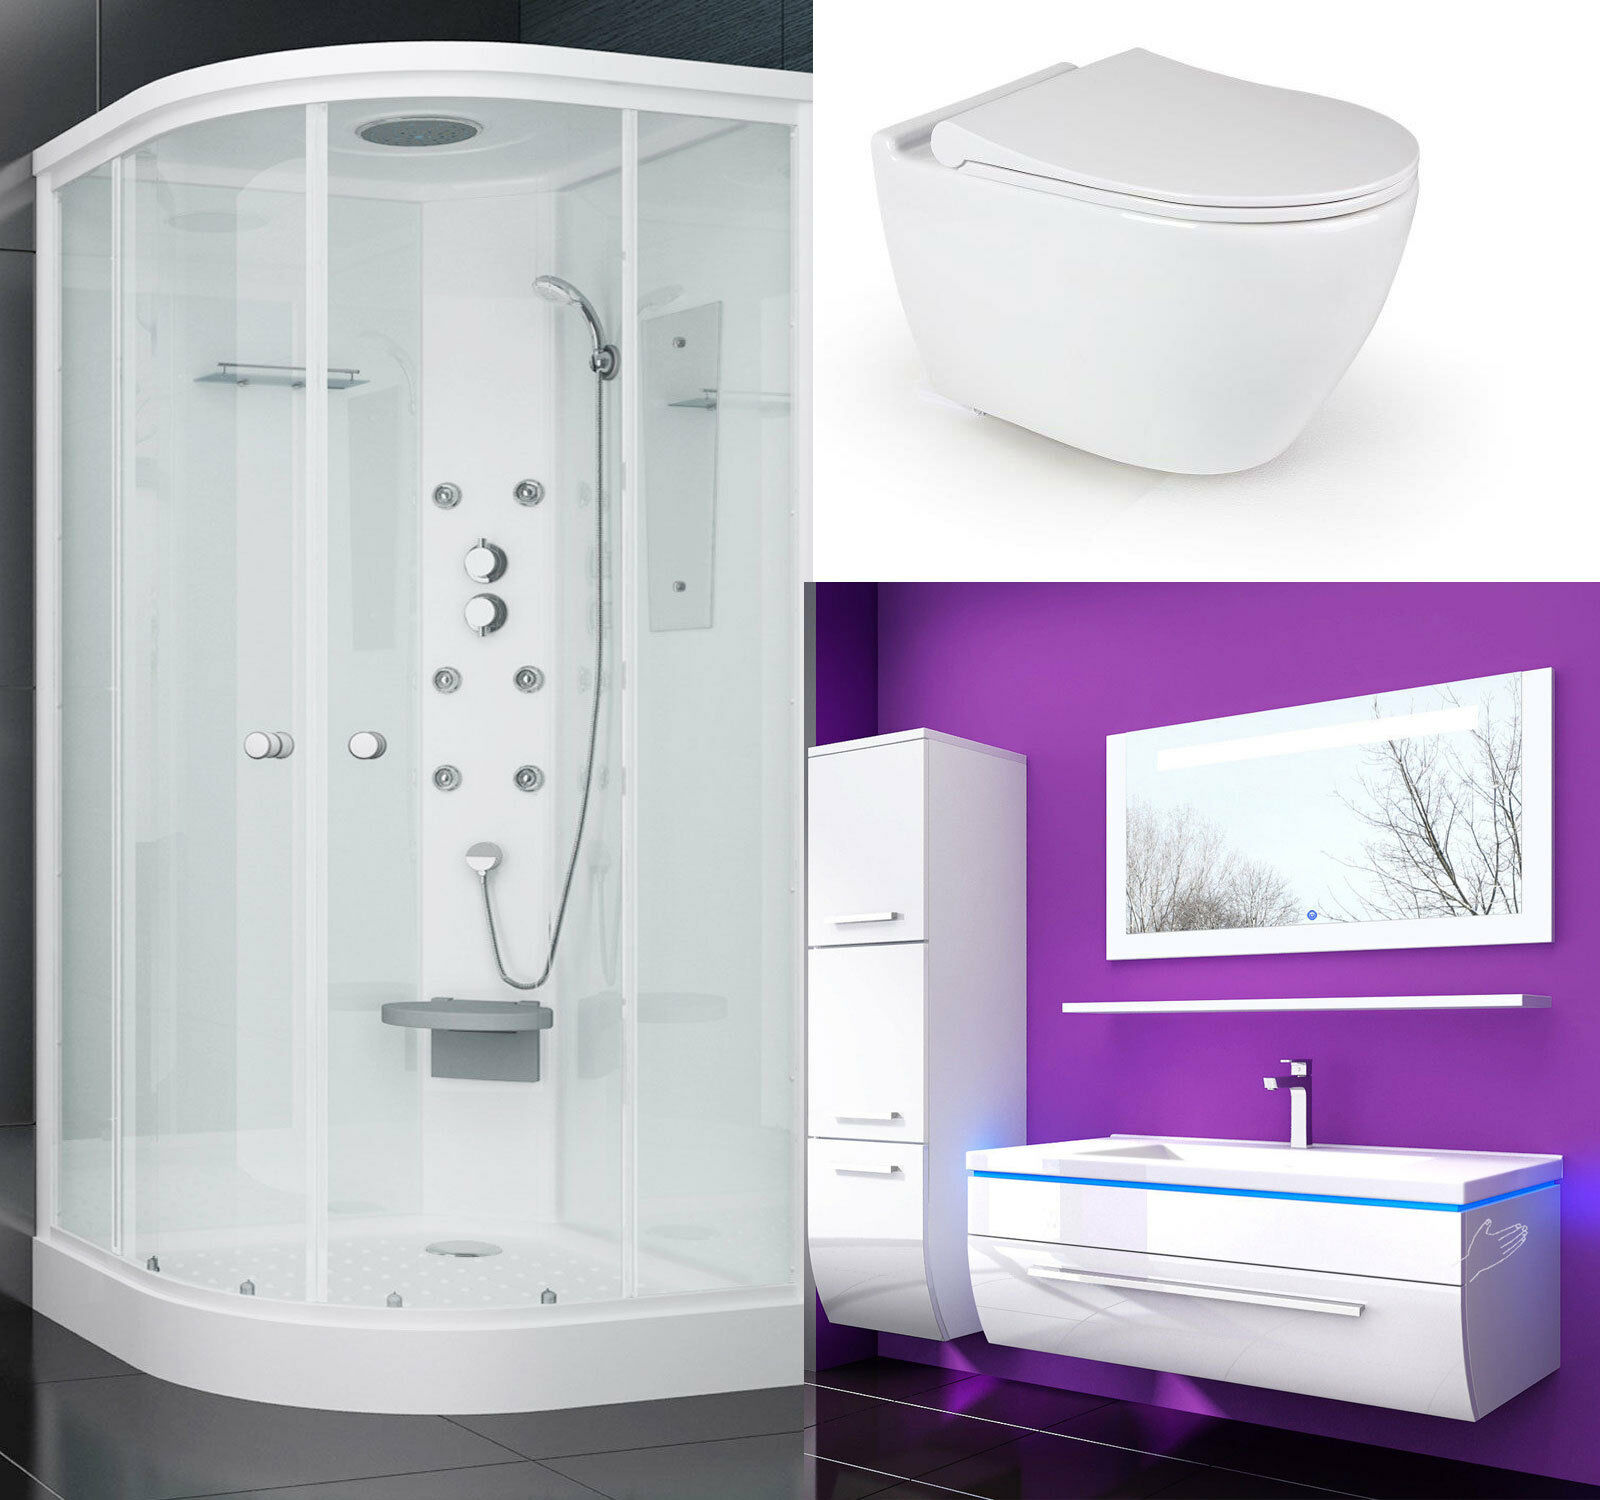 duschkabine 90x90 wc sitz absenkautomatik wand h nge wc keramik badm bel set ebay. Black Bedroom Furniture Sets. Home Design Ideas